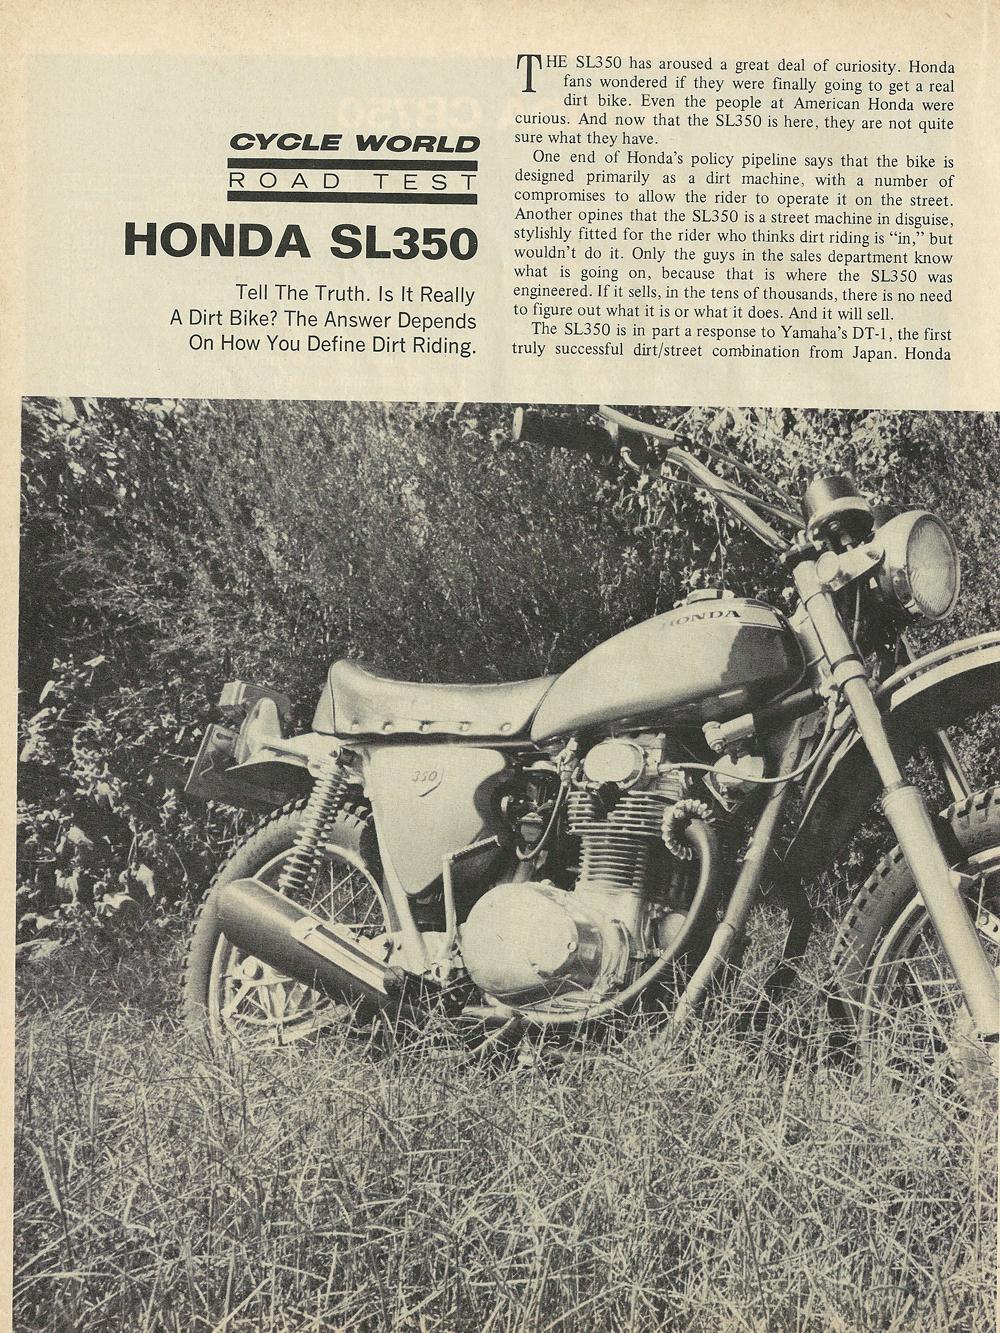 1969 Honda SL350 road test 1.jpg